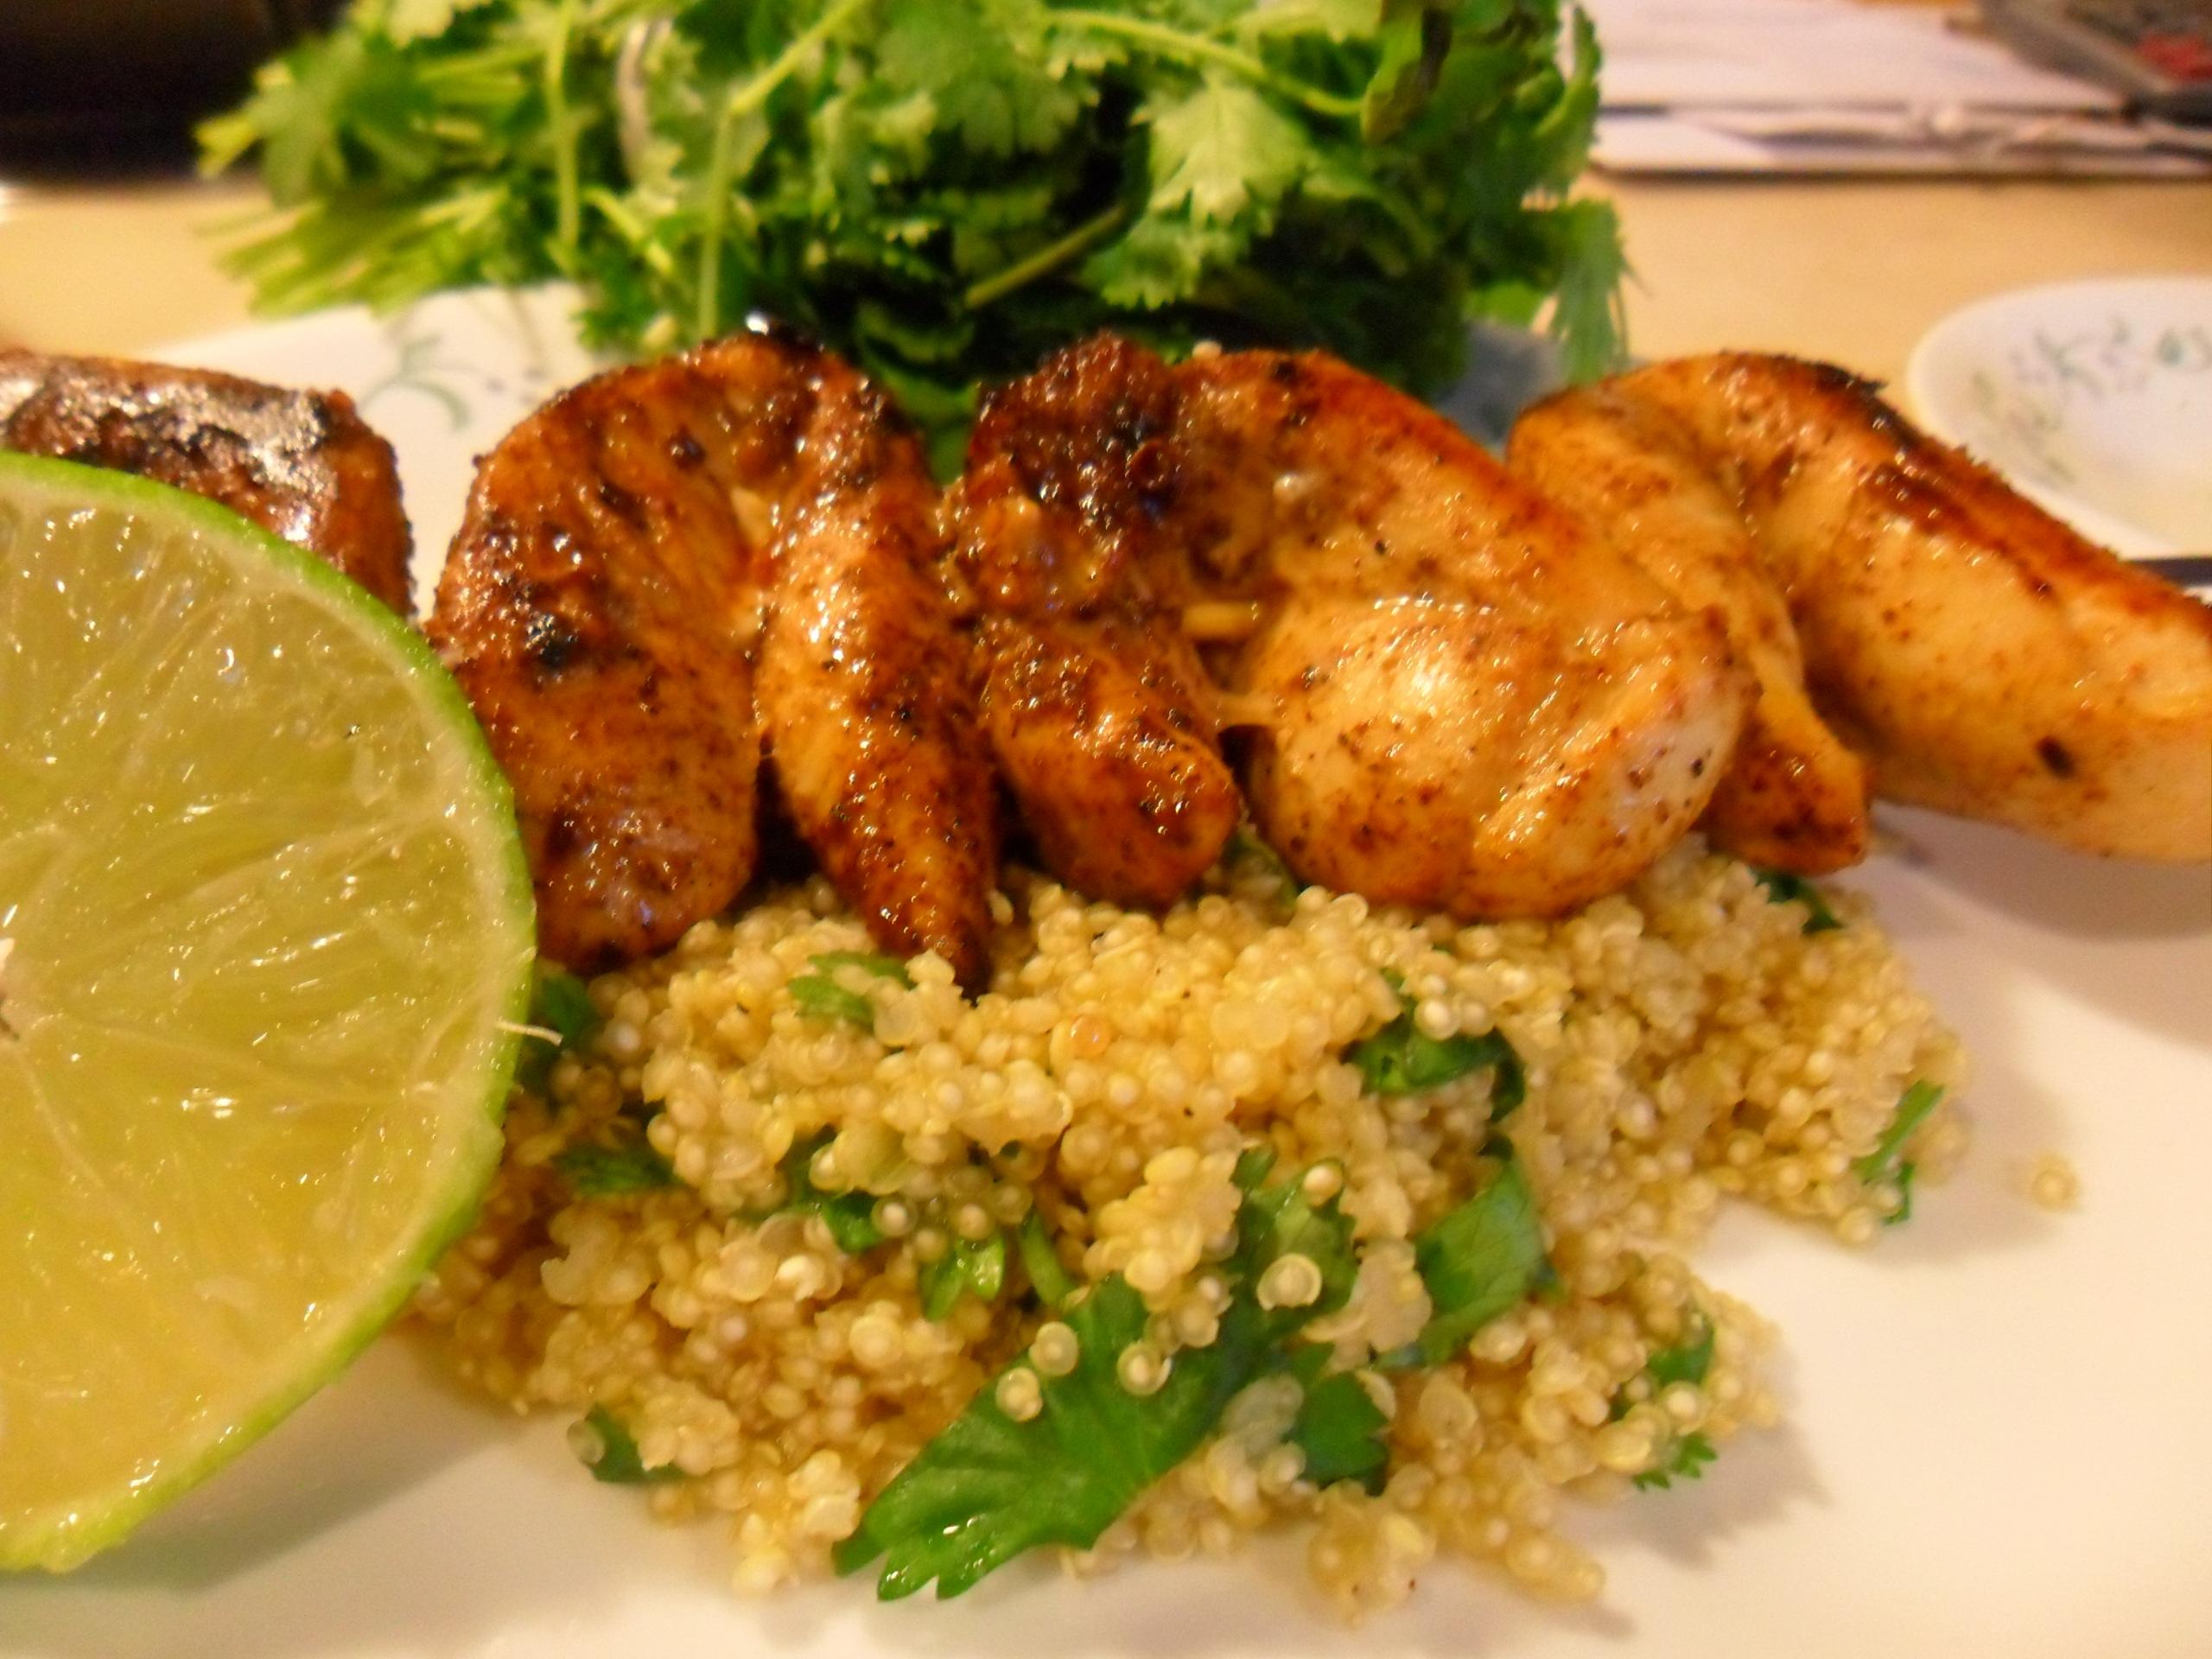 Spicy-Skewered Chicken & Cilantro-Lime Quinoa | Collegiate Culinaire